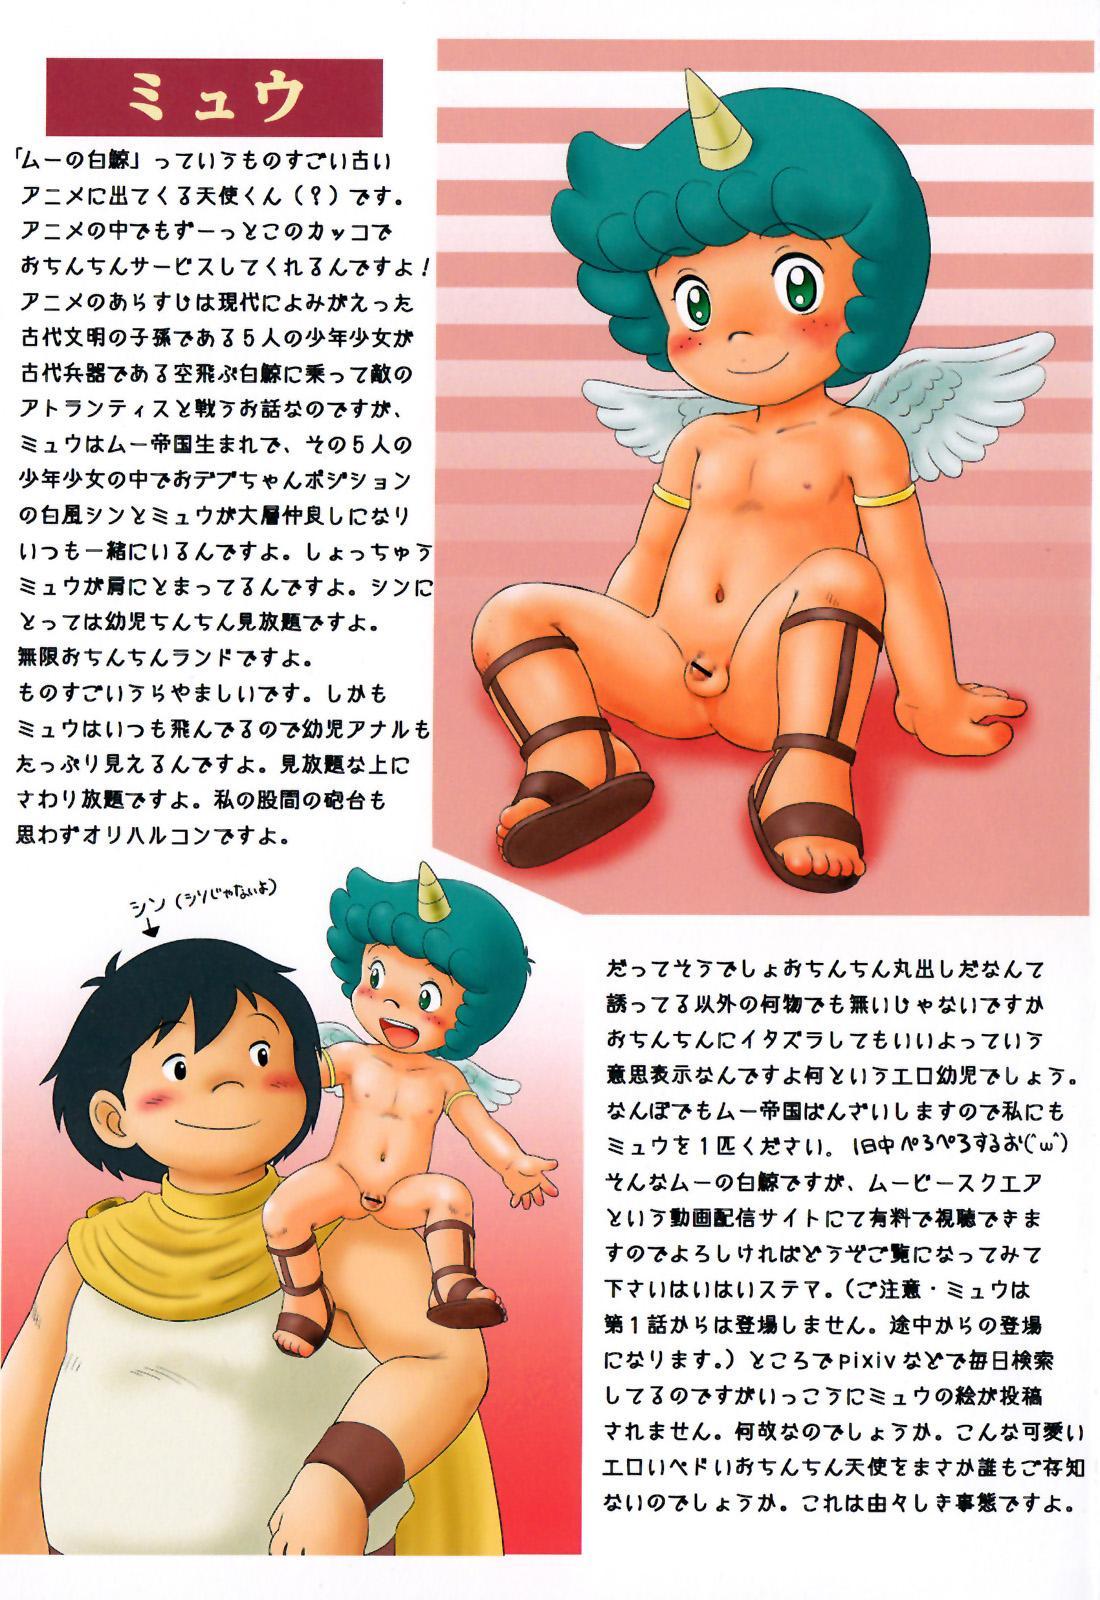 Mitsui Jun (Sennen Teikoku) - Dreamer's Only Petit (Various) 9